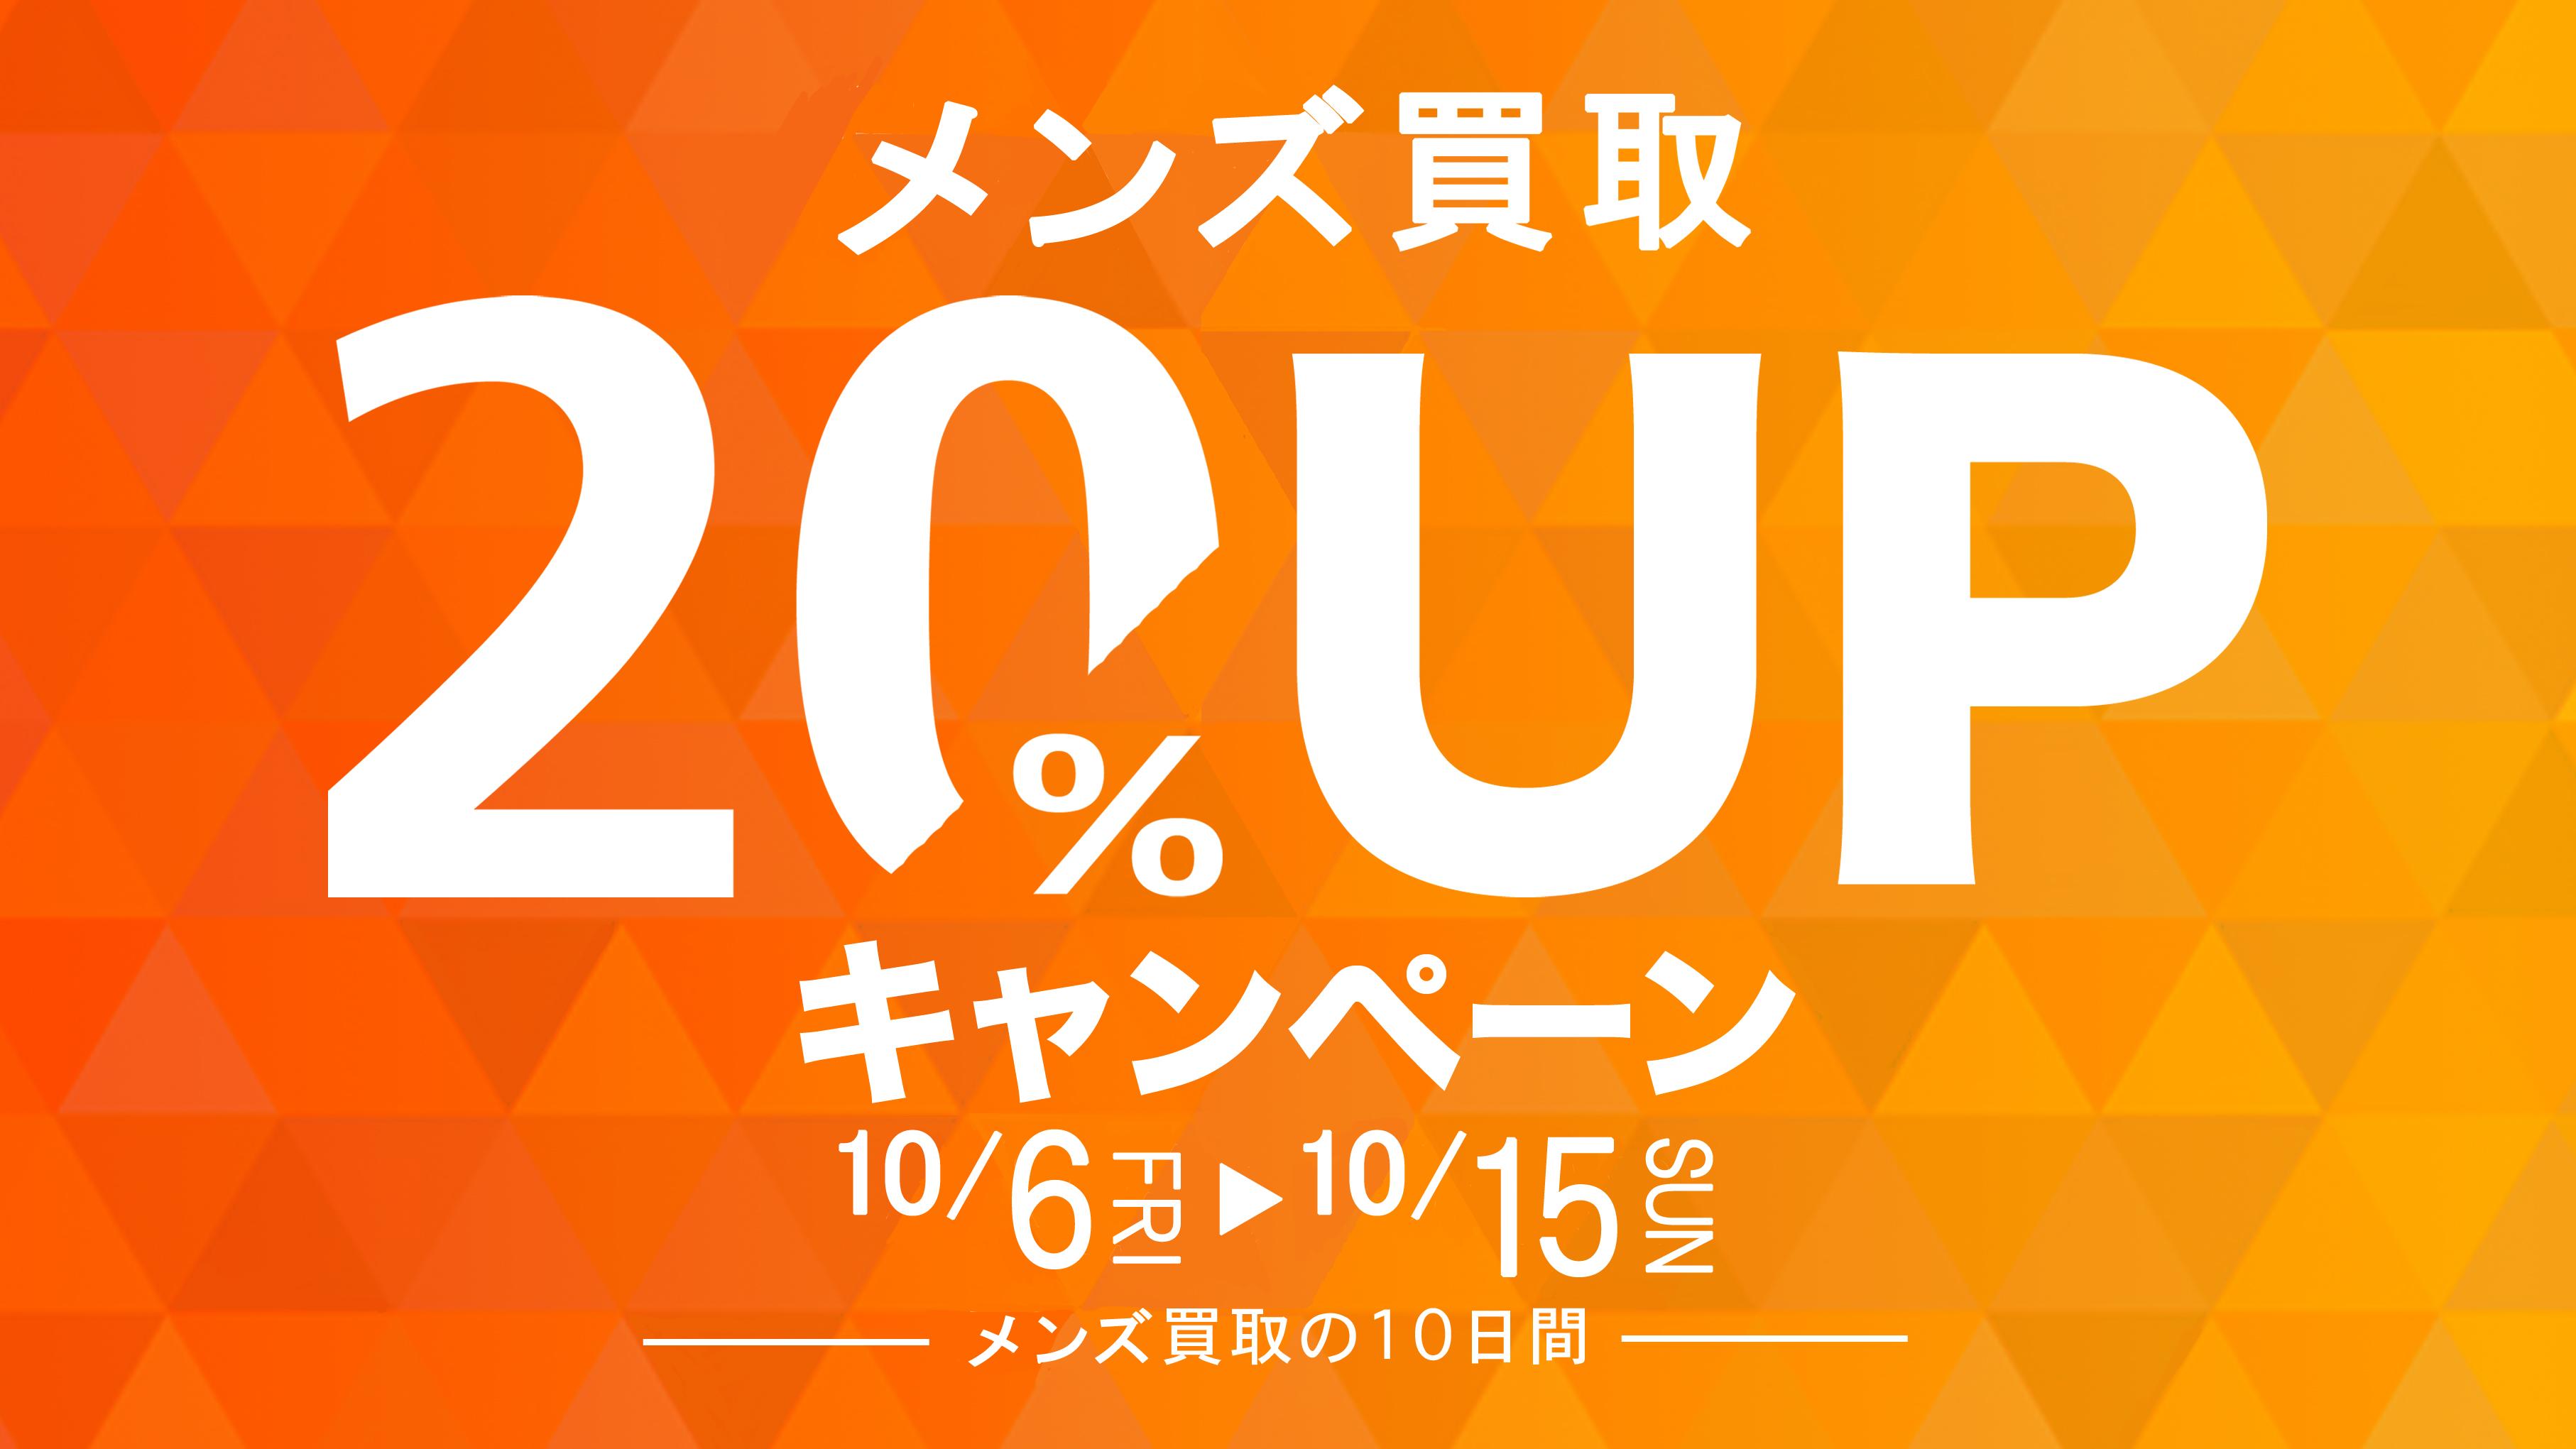 kaitori-saine %281%29のコピー